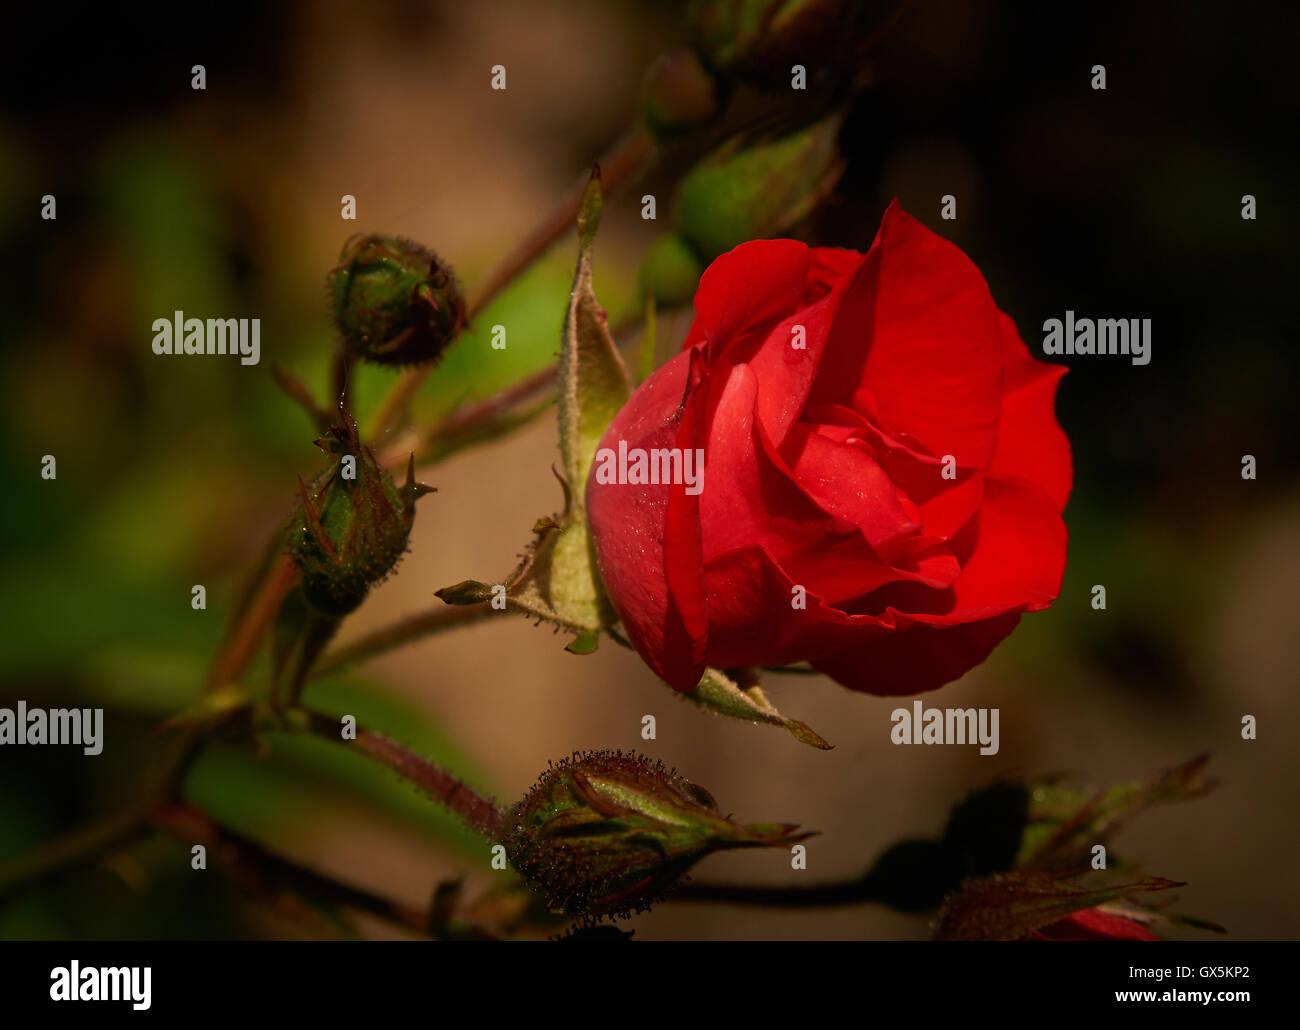 Dramatically Stock Photos & Dramatically Stock Images - Alamy